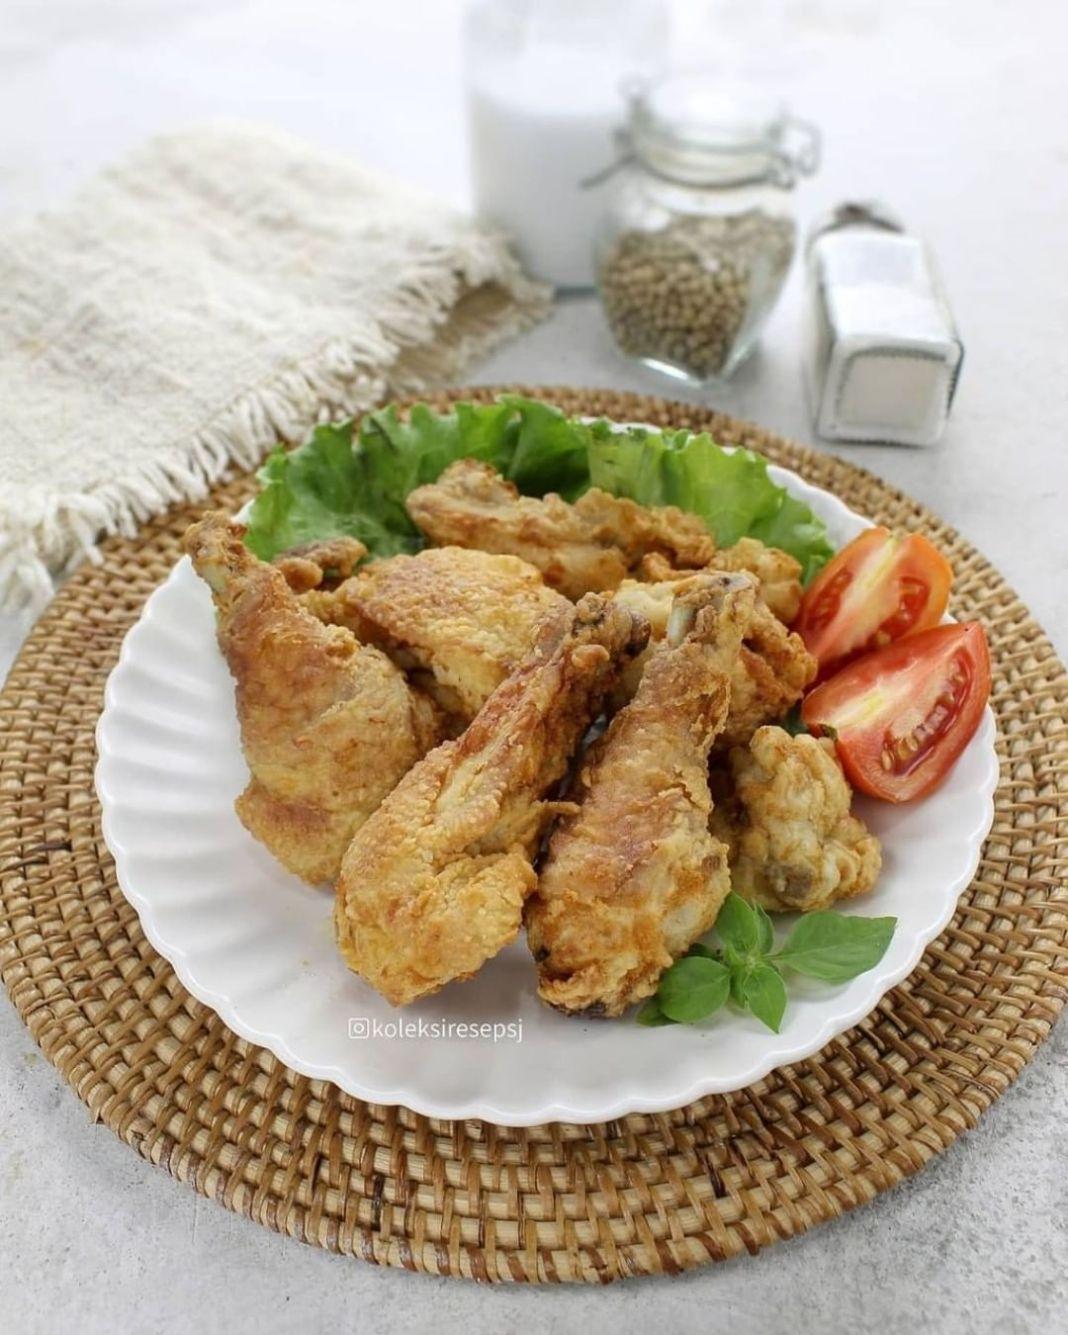 Info kuliner, AYAM GORENG BUTTERMILK by @koleksiresepsj . Bahan: 1 ekor ayam, potong 10 bagian 3/4 SDT garam …